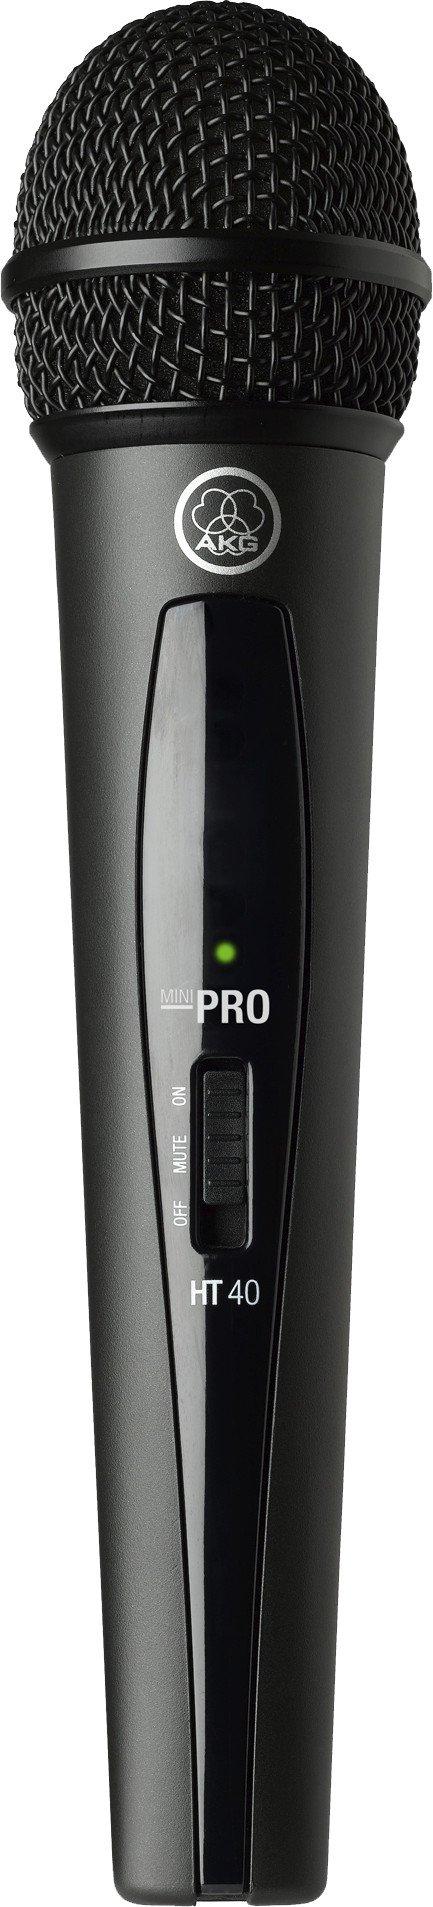 AKG Pro Audio MINI2MIX-US25AB Wireless Microphone System by AKG Pro Audio (Image #3)